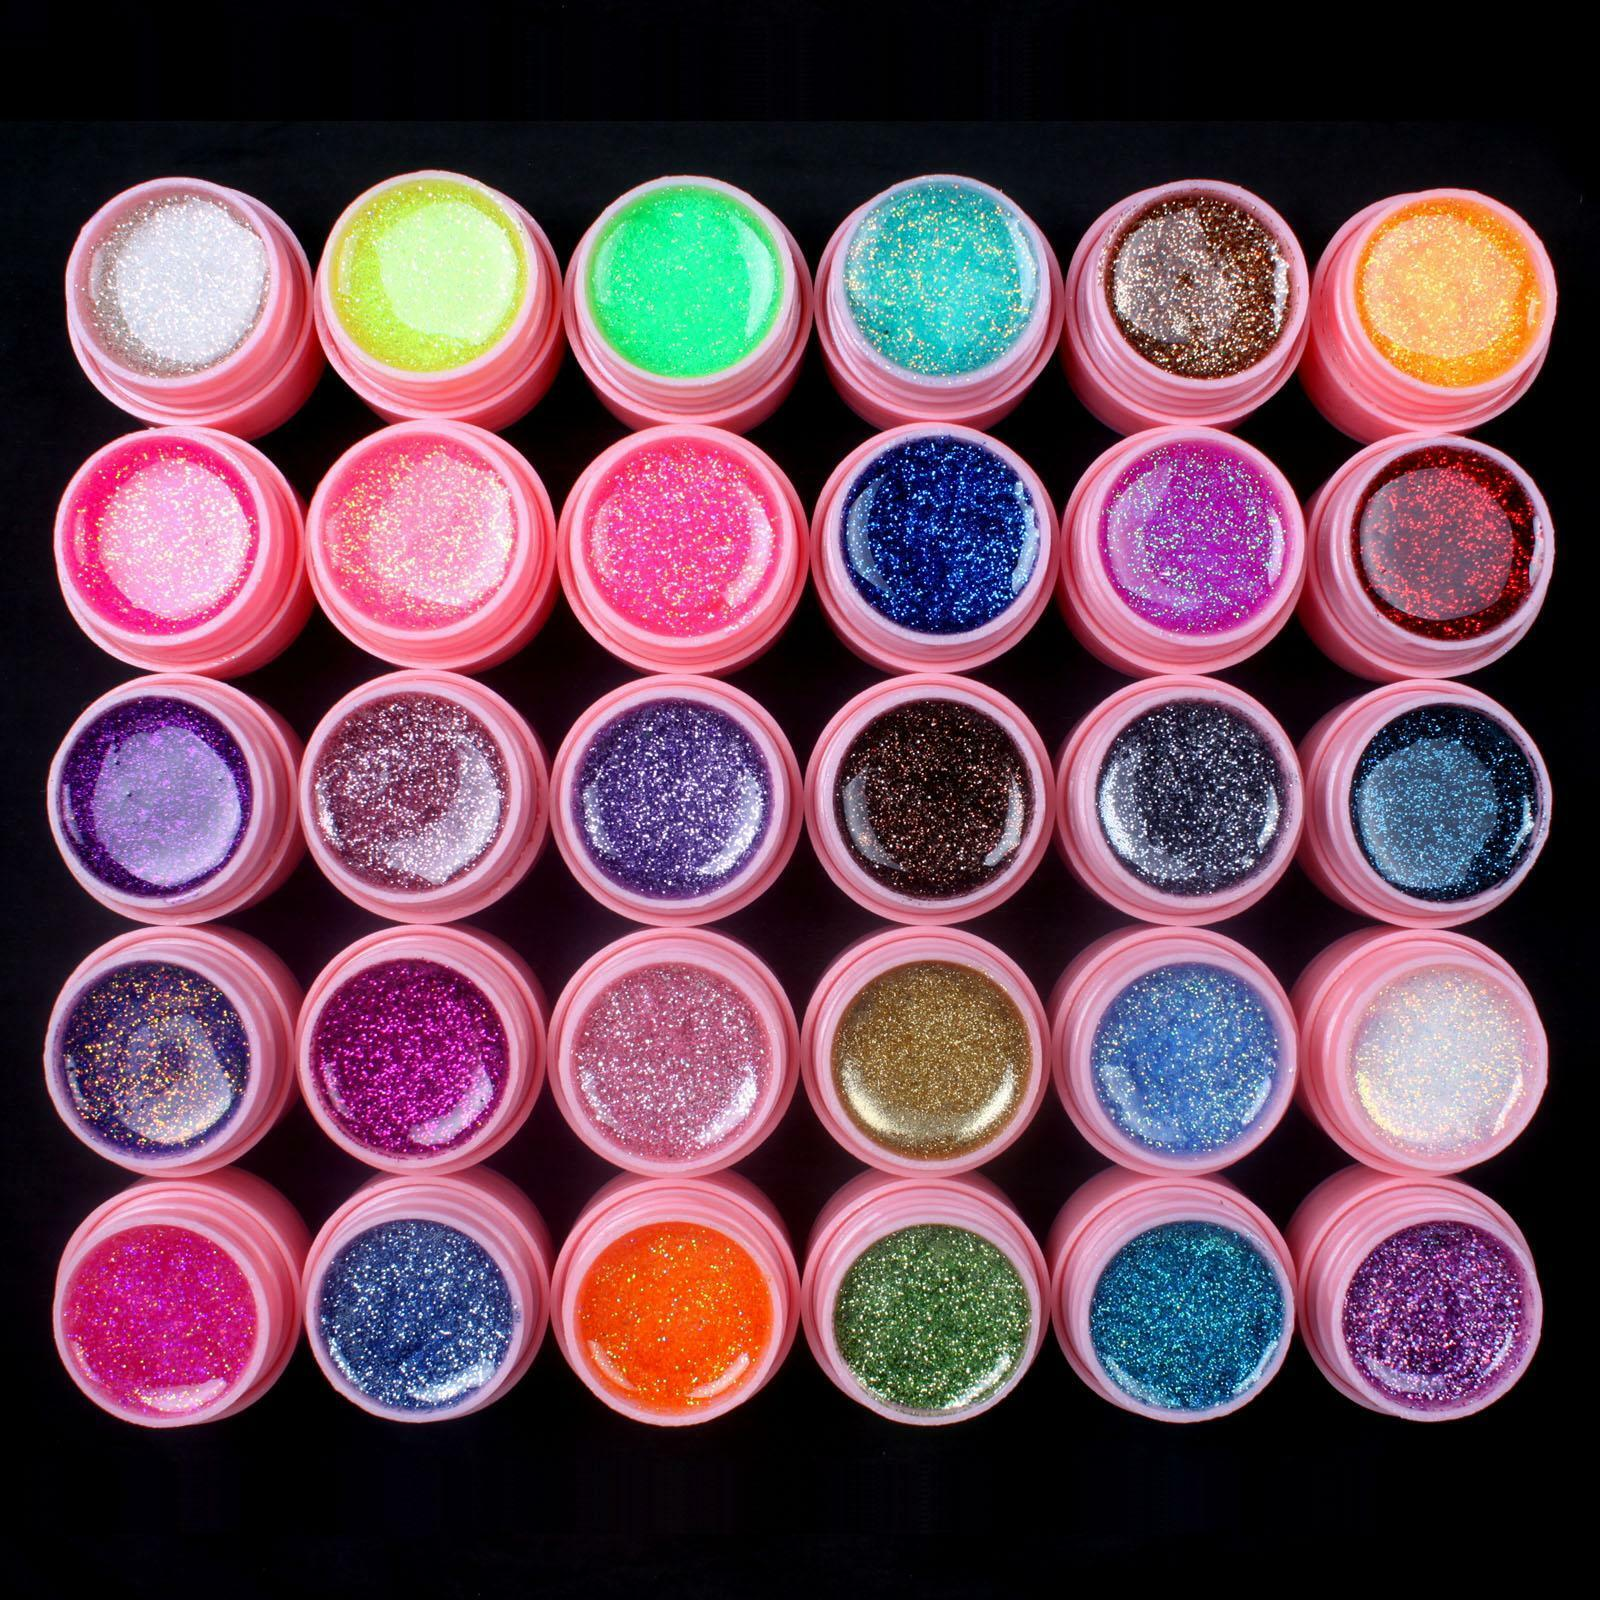 30 pcs mix glitter cores uv builder gel acrilico set para nail art tips rosa novo